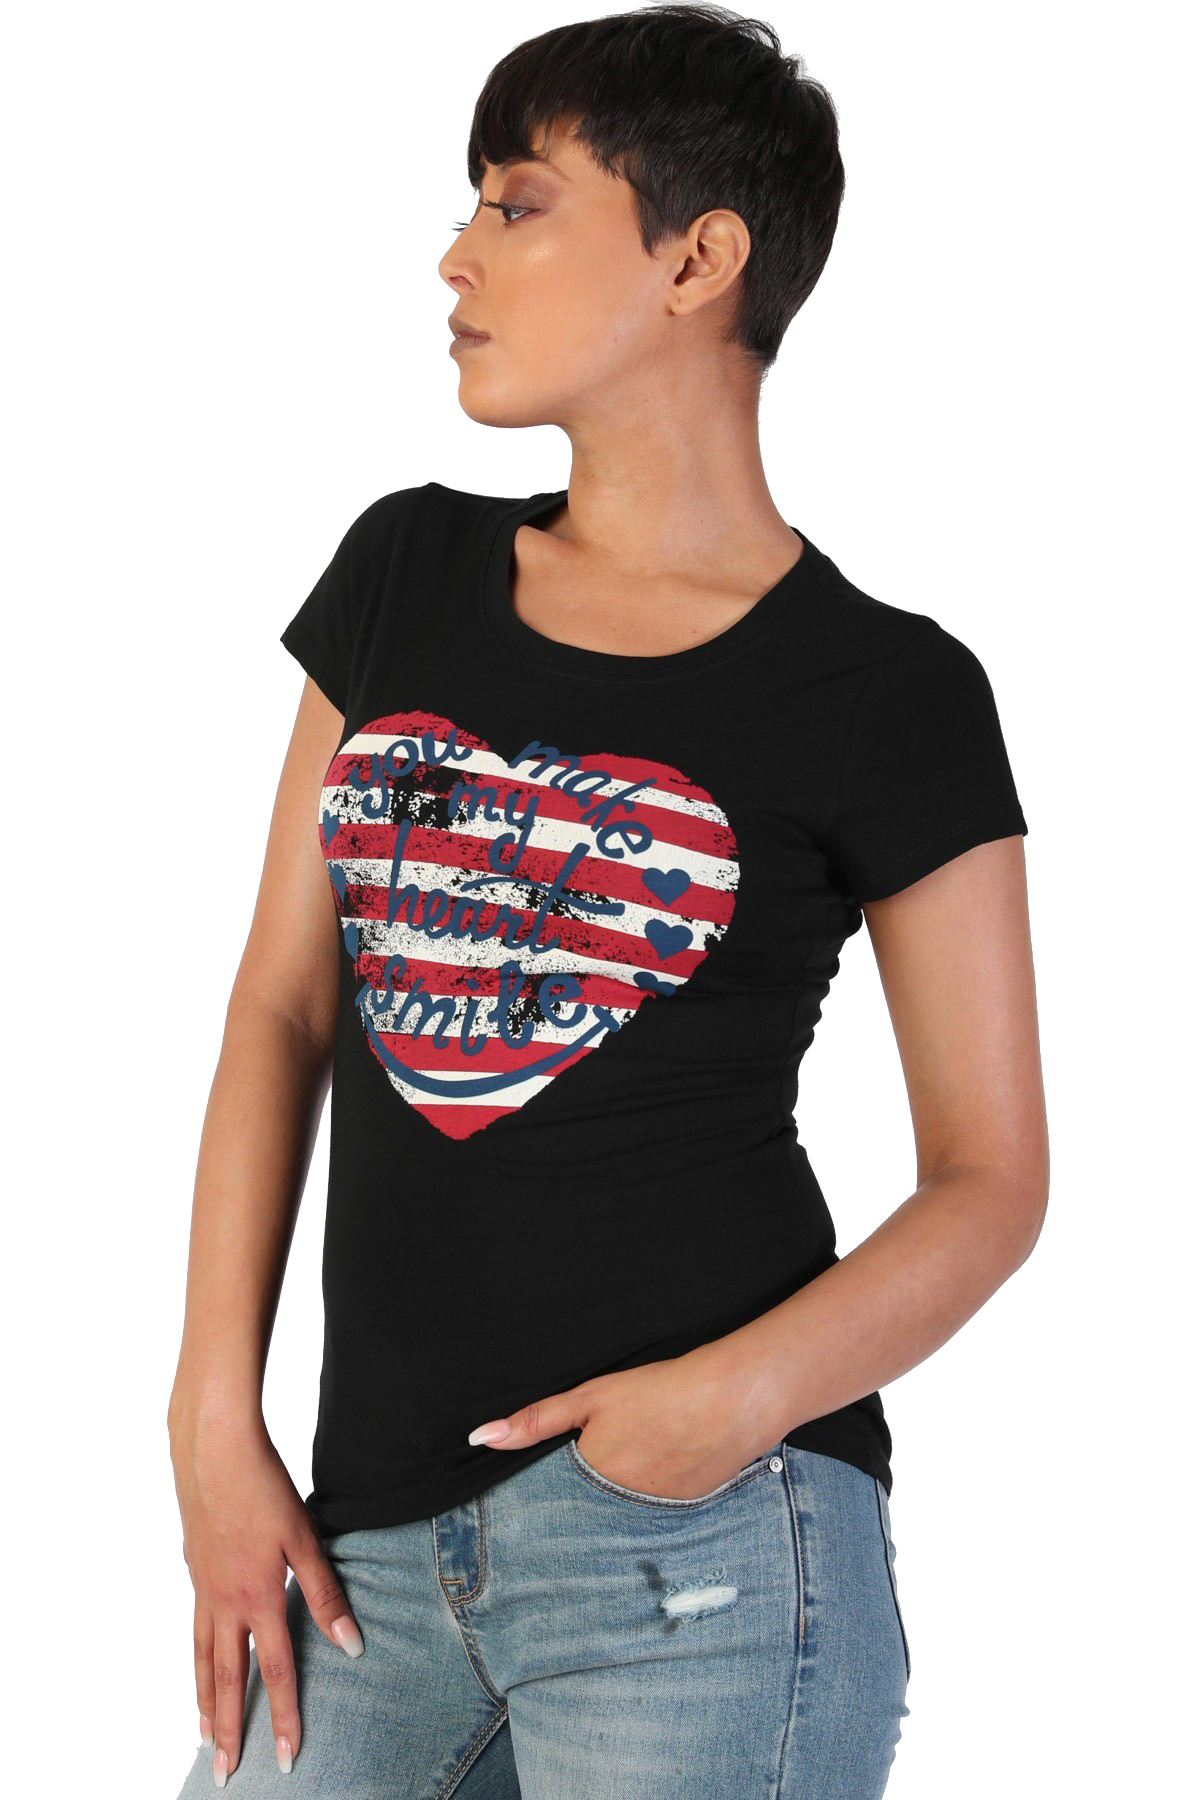 Women-039-s-Juniors-Patriotic-Casual-Graphic-Print-Short-Sleeve-T-Shirt-Top thumbnail 6